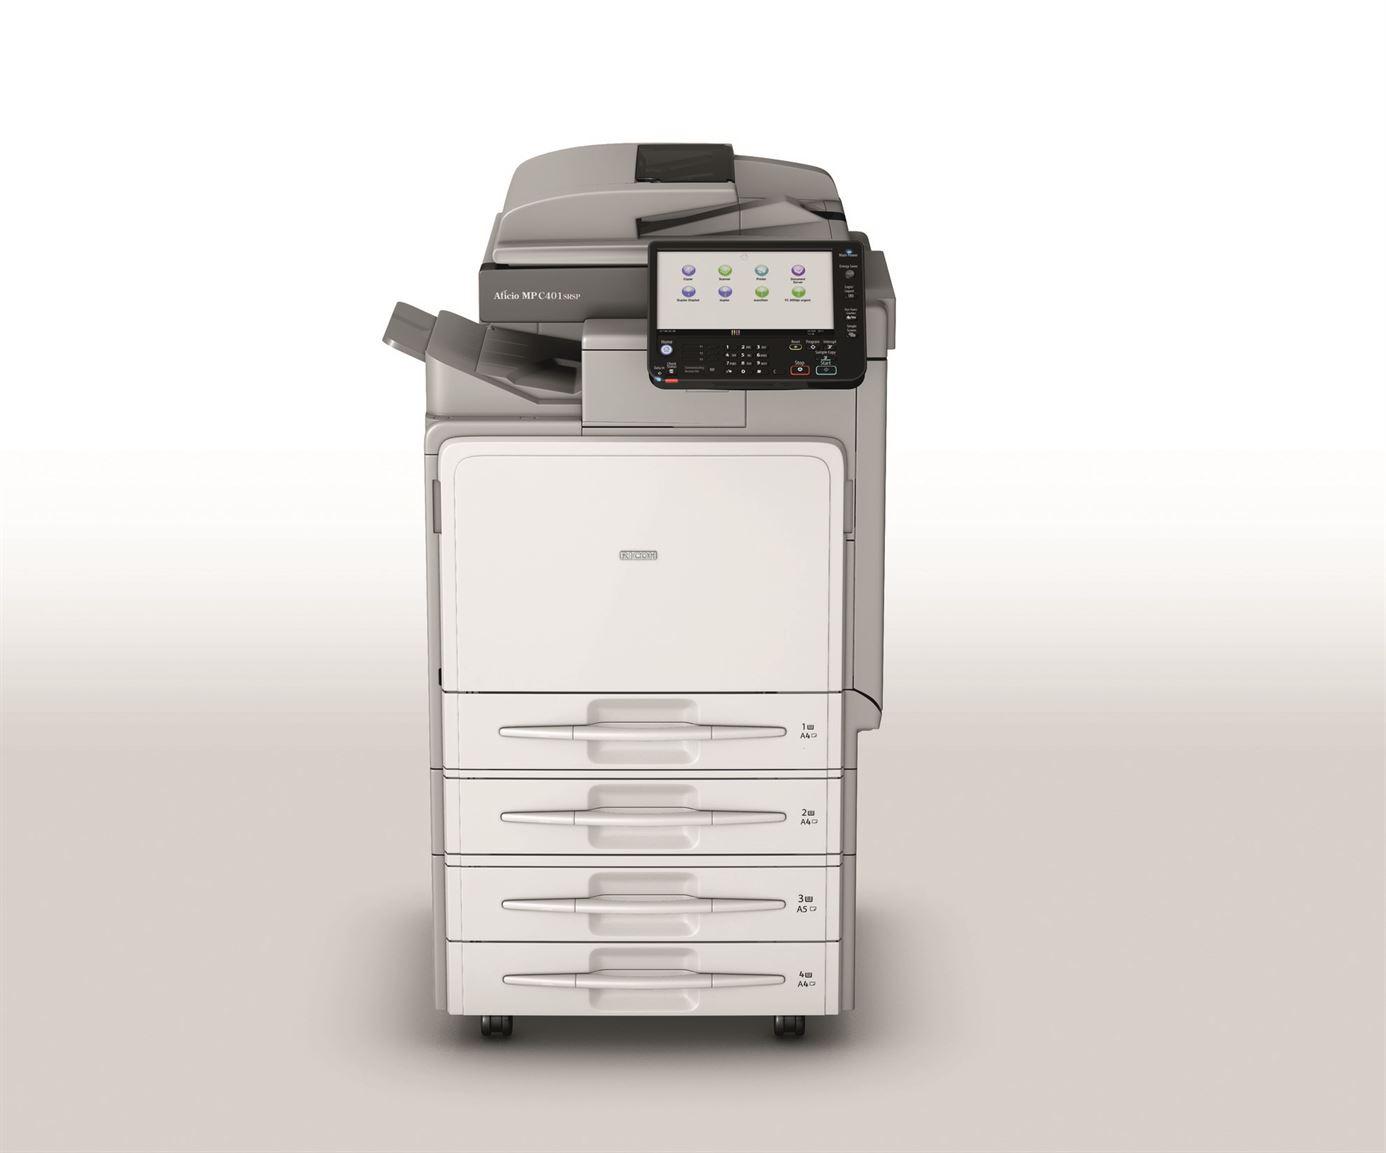 Ricoh MP 401SPF Printer PCL 6 Driver for Windows Mac